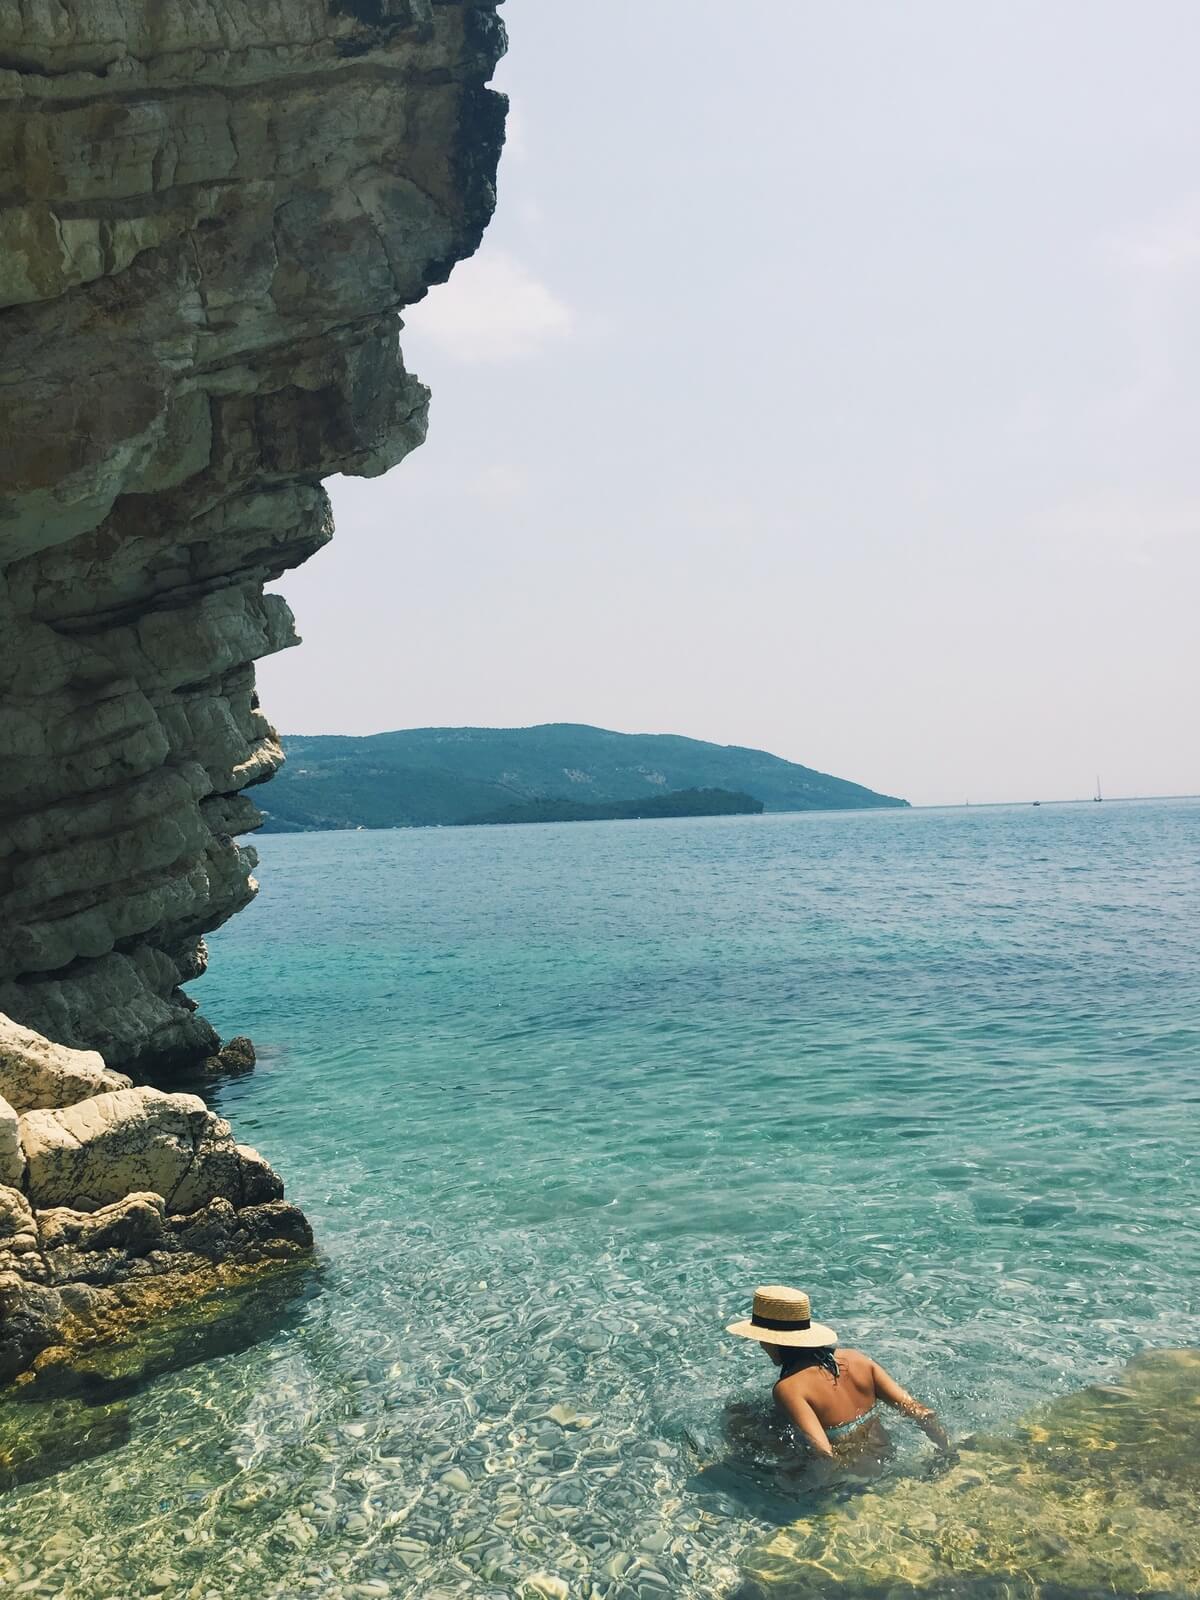 Beach in Lefkada, Greece